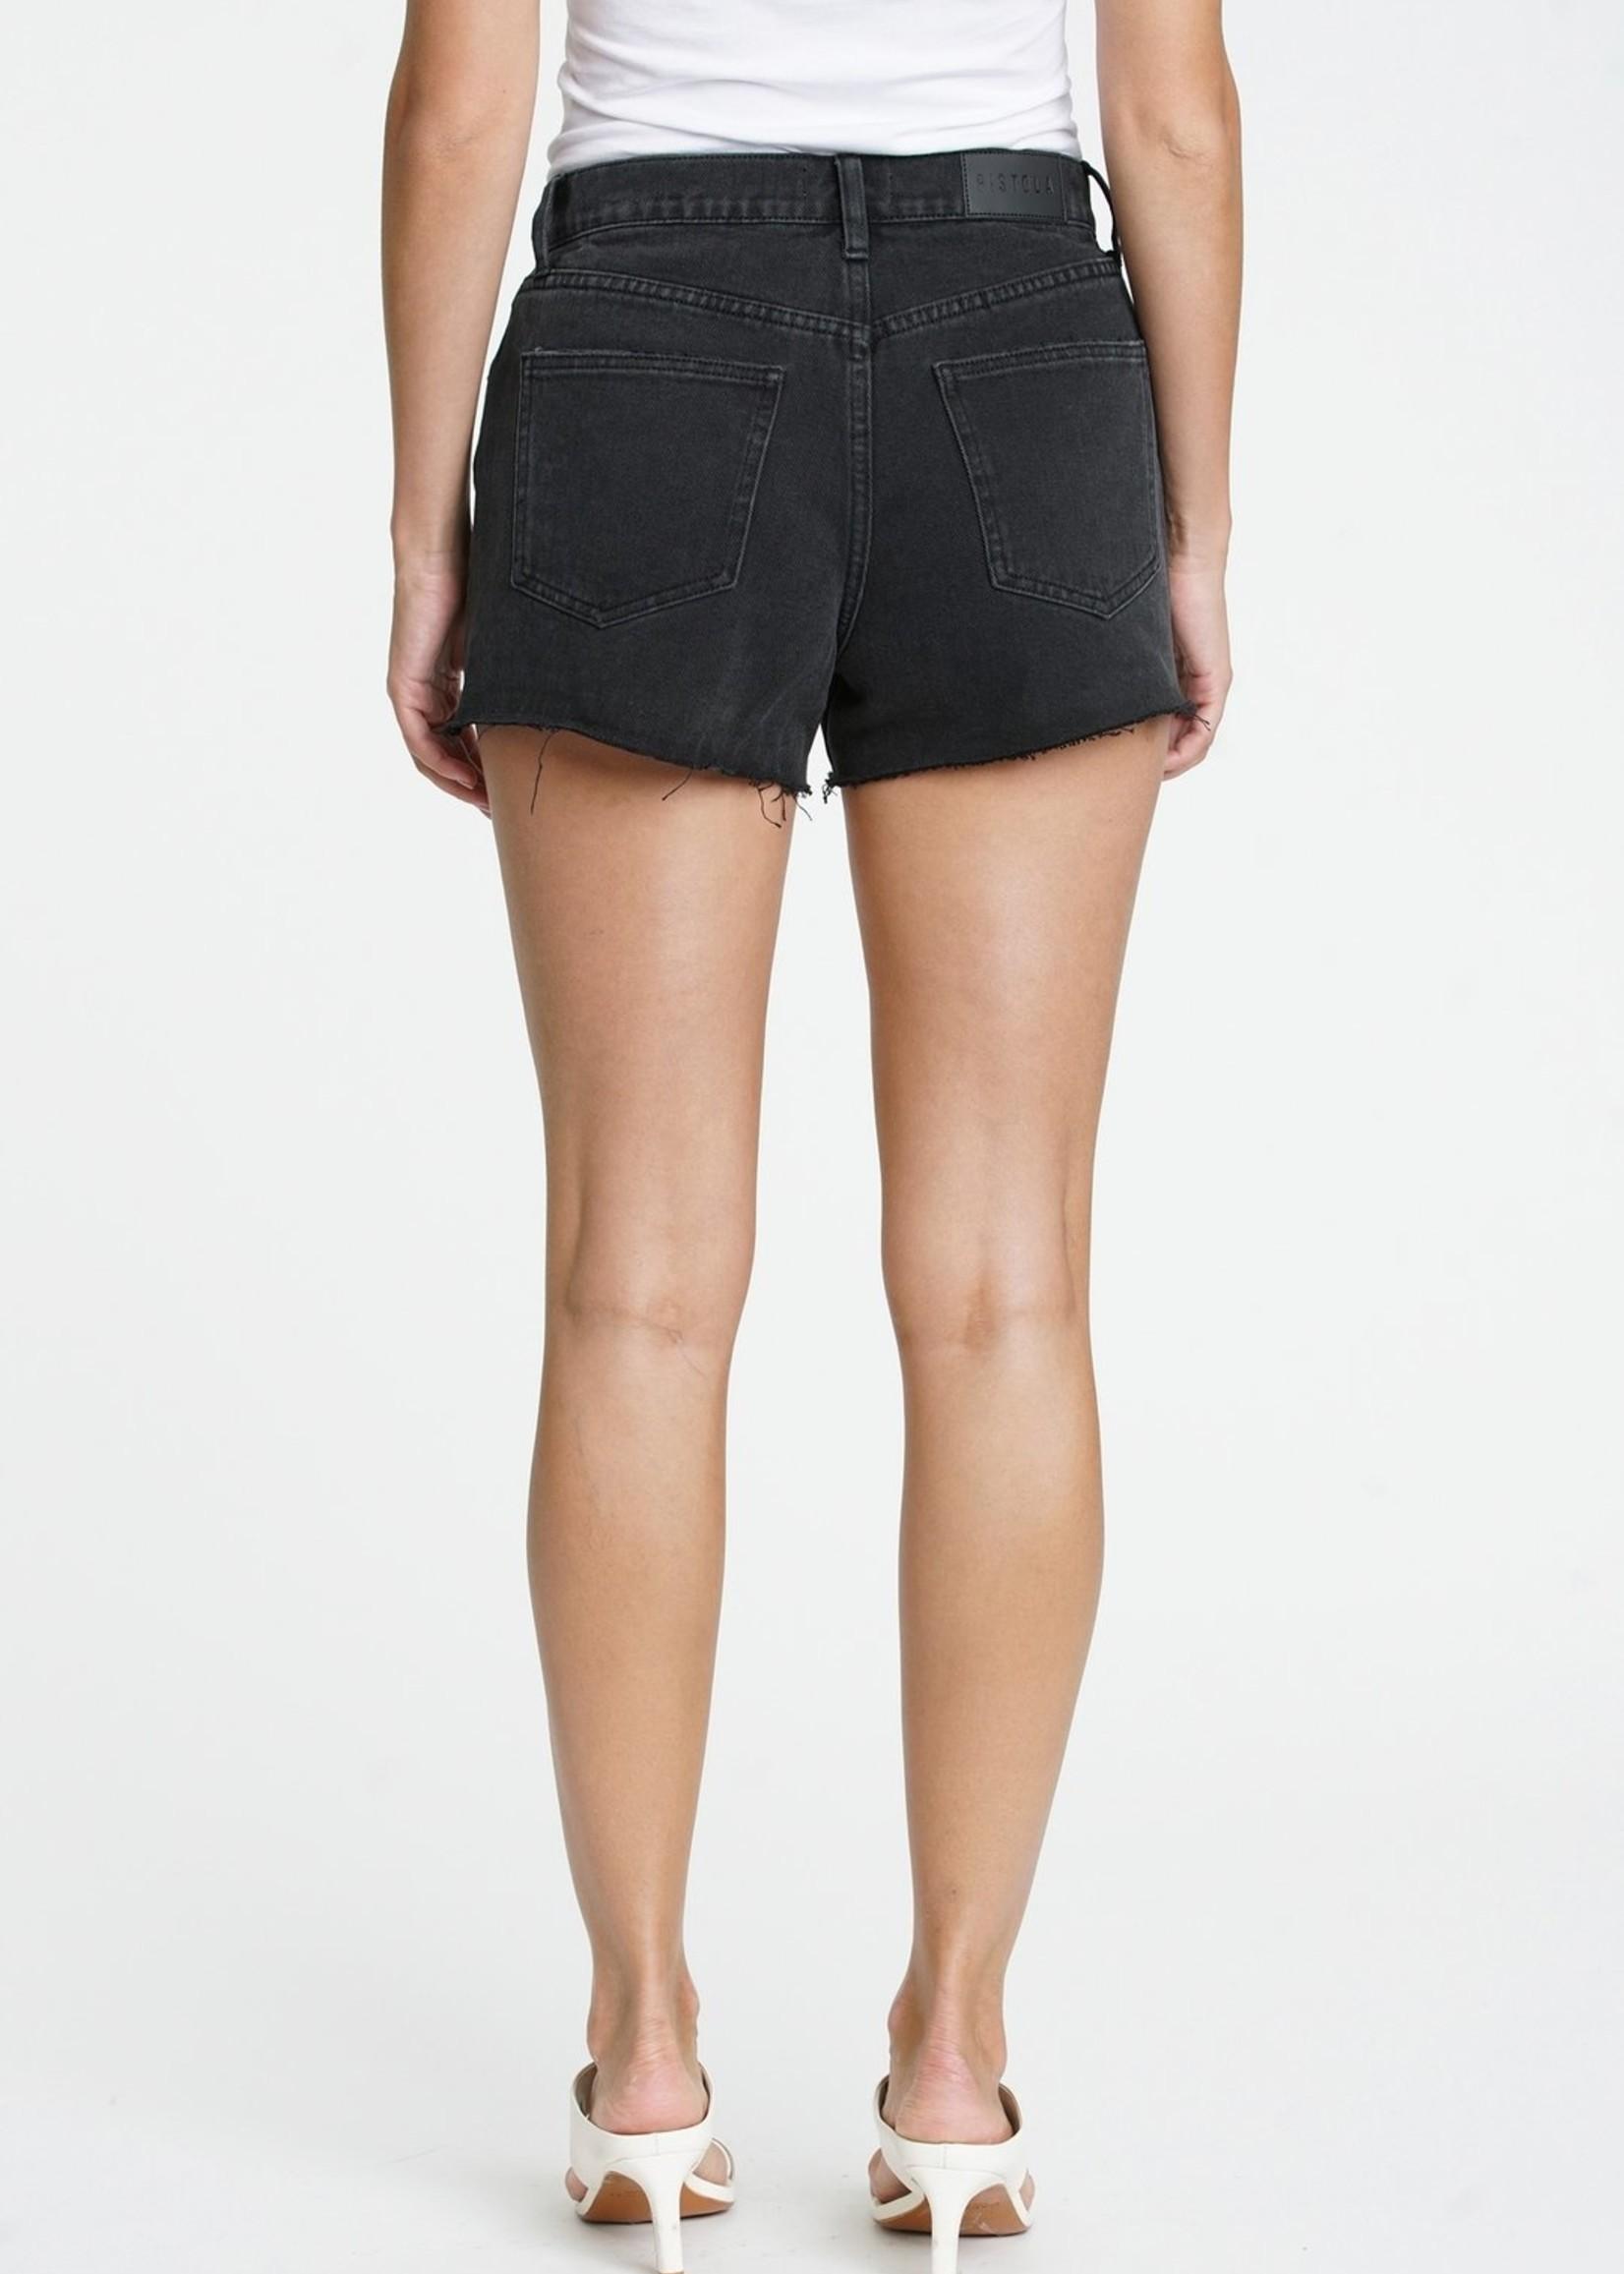 Pistola Black Cuffed Distressed Shorts